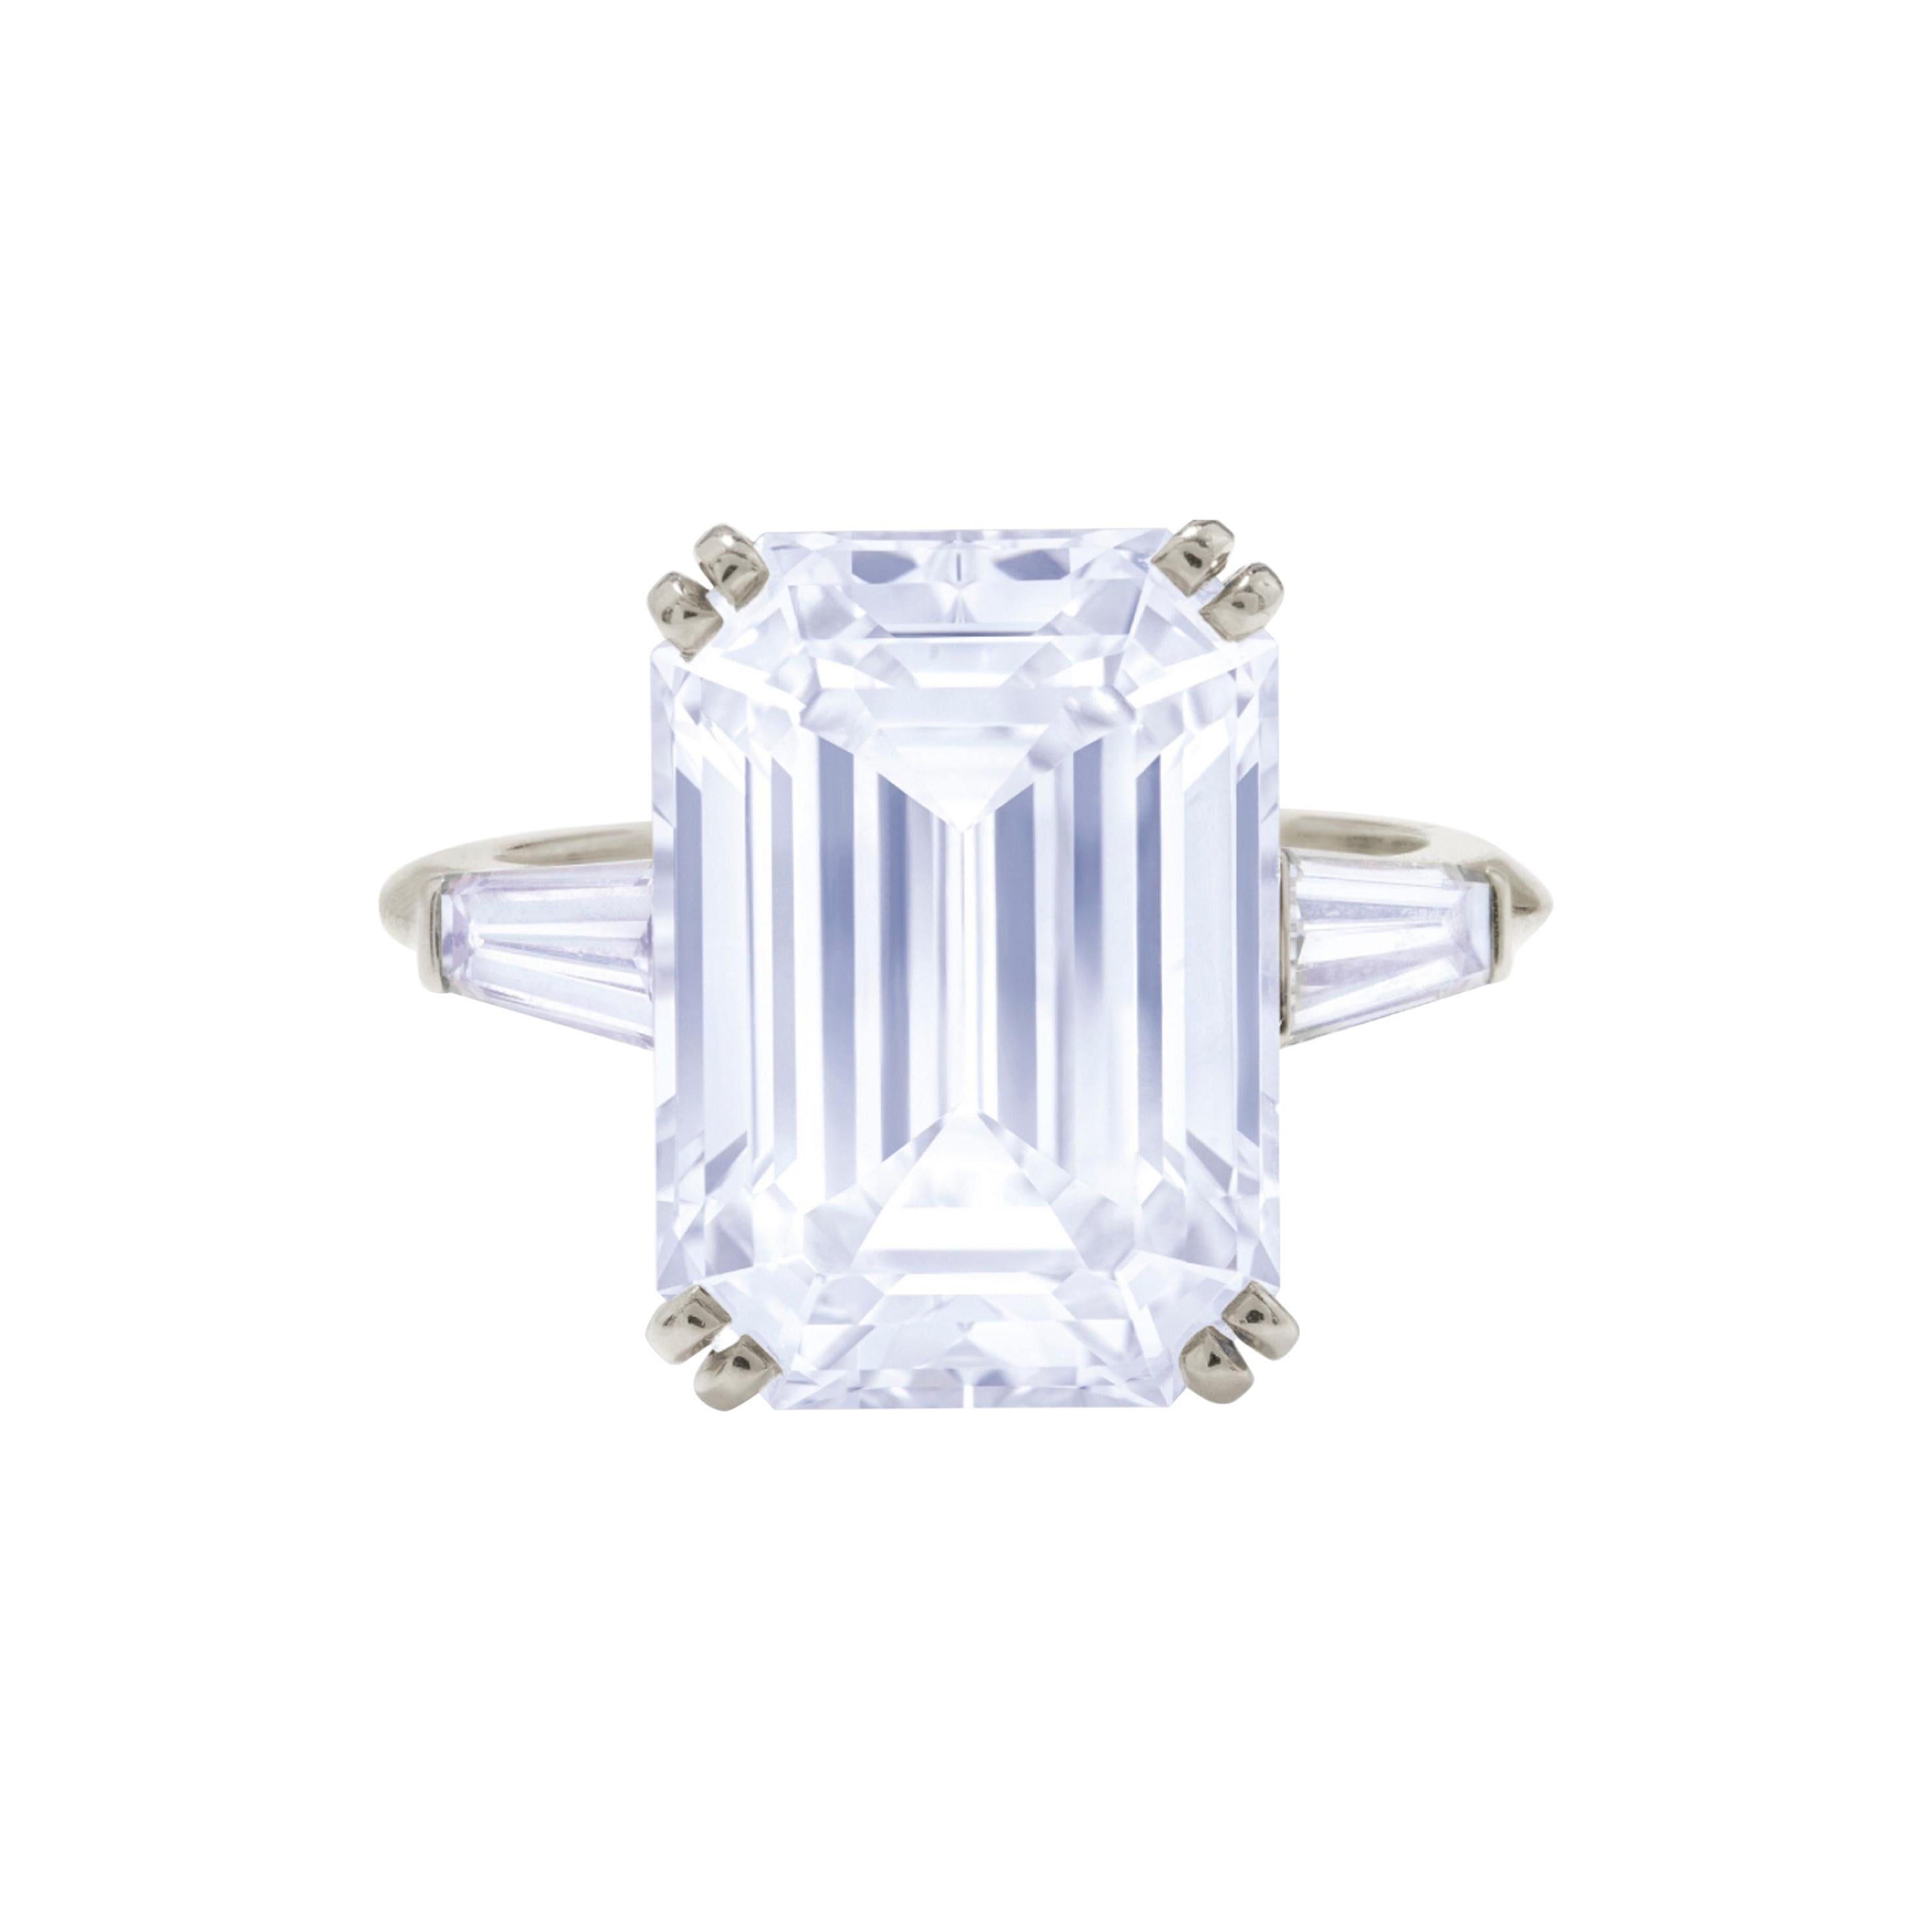 GIA Certified 5.75 Carat Emerald Cut Diamond Platinum Ring